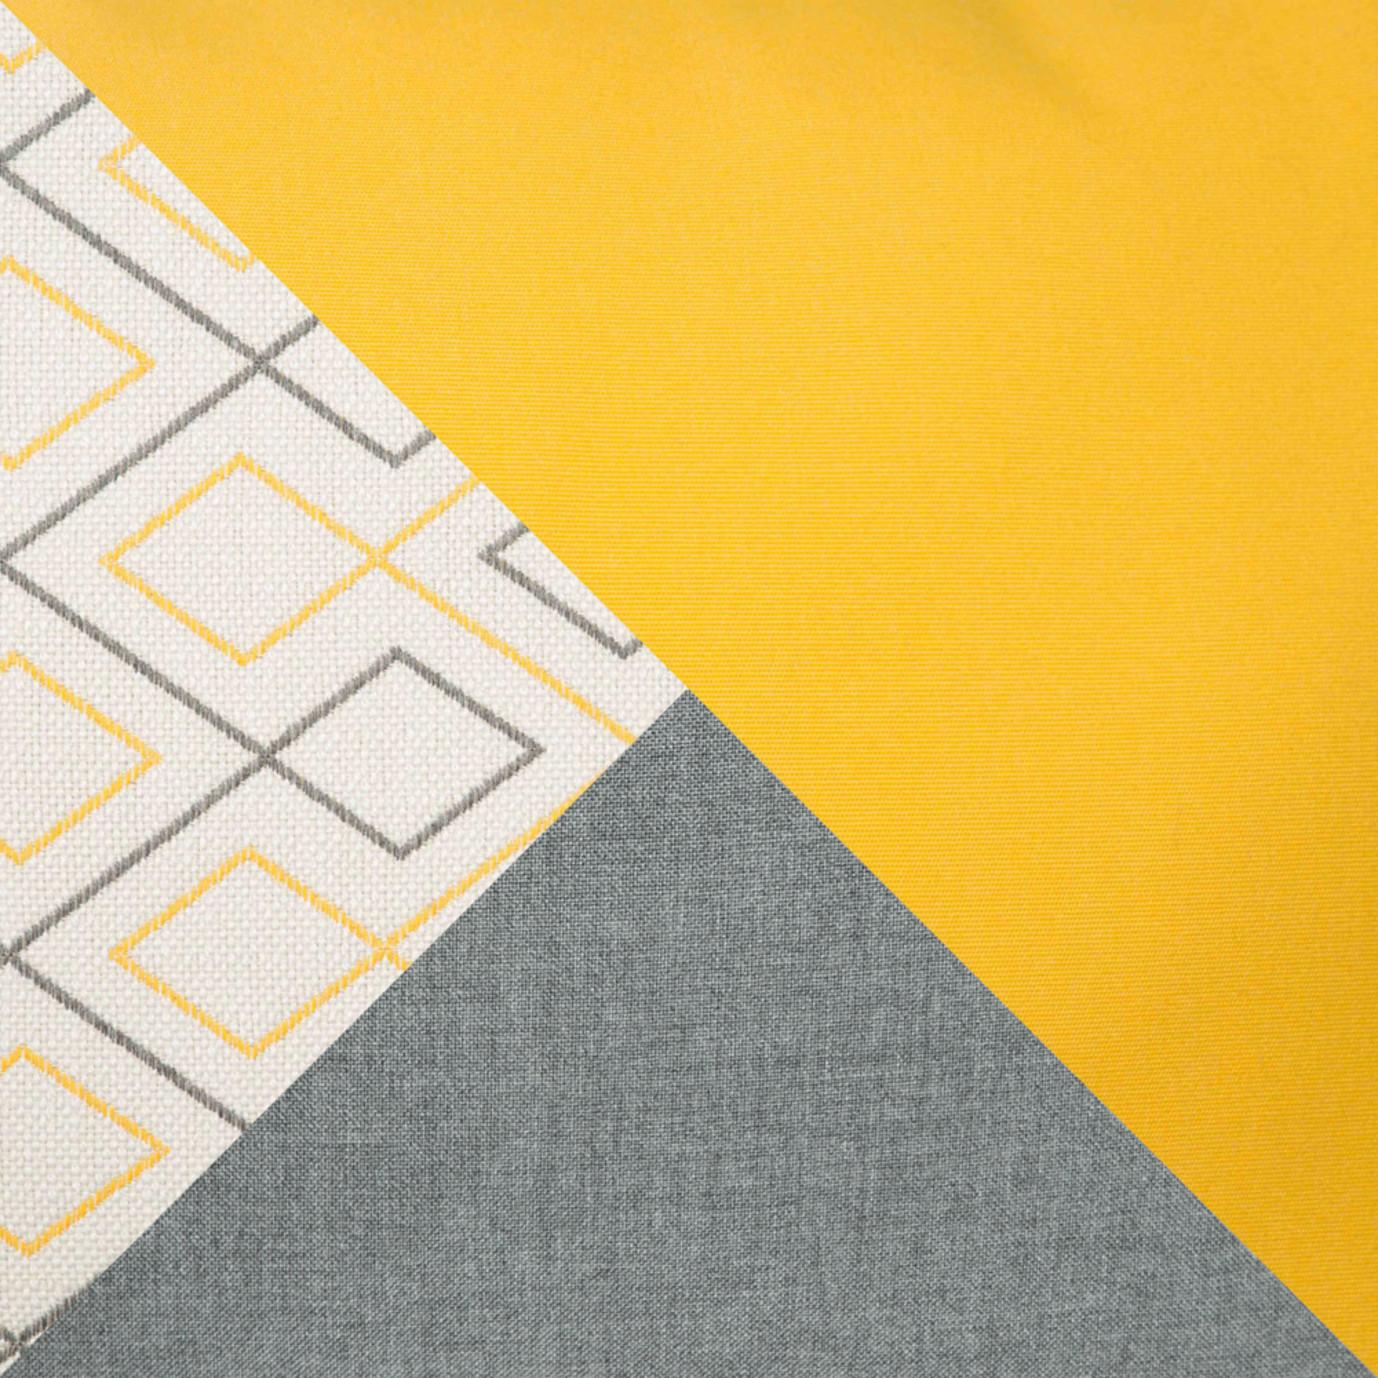 Barcelo™ Sofa & Coffee Table - Sunflower Yellow